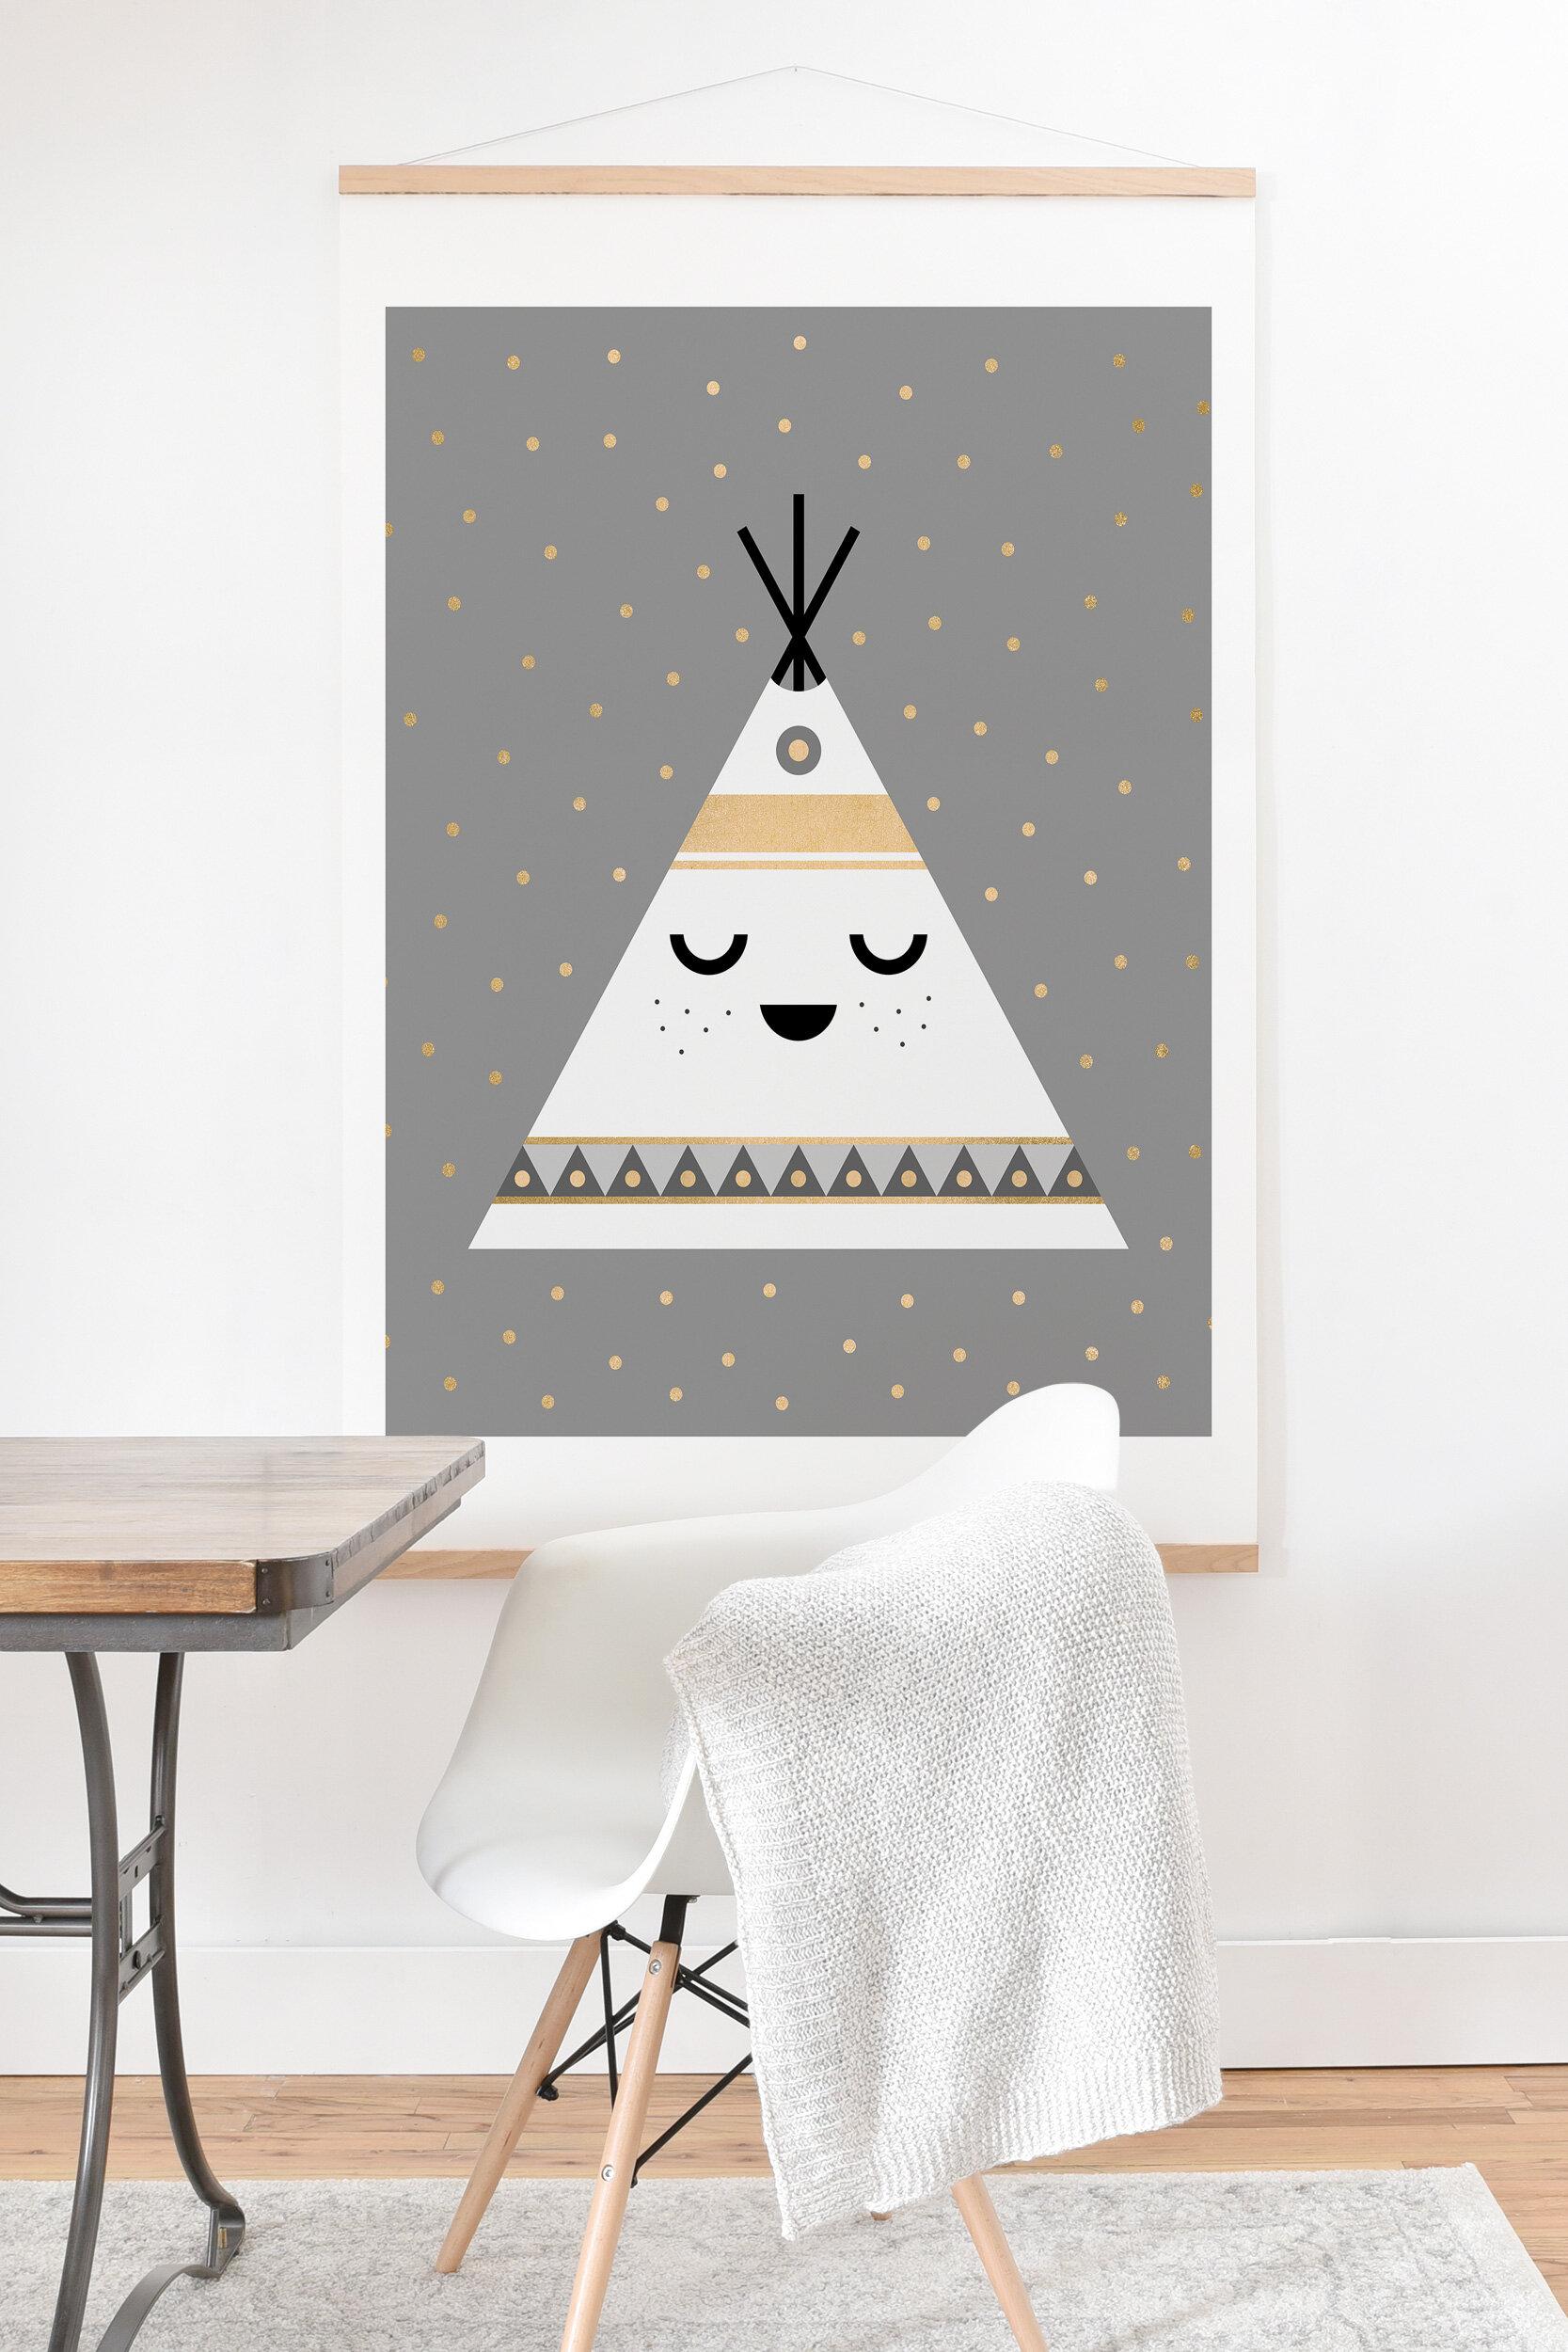 Tribal Nursery Wall Decor Prints Teepee Prints Your choice of Size Layout